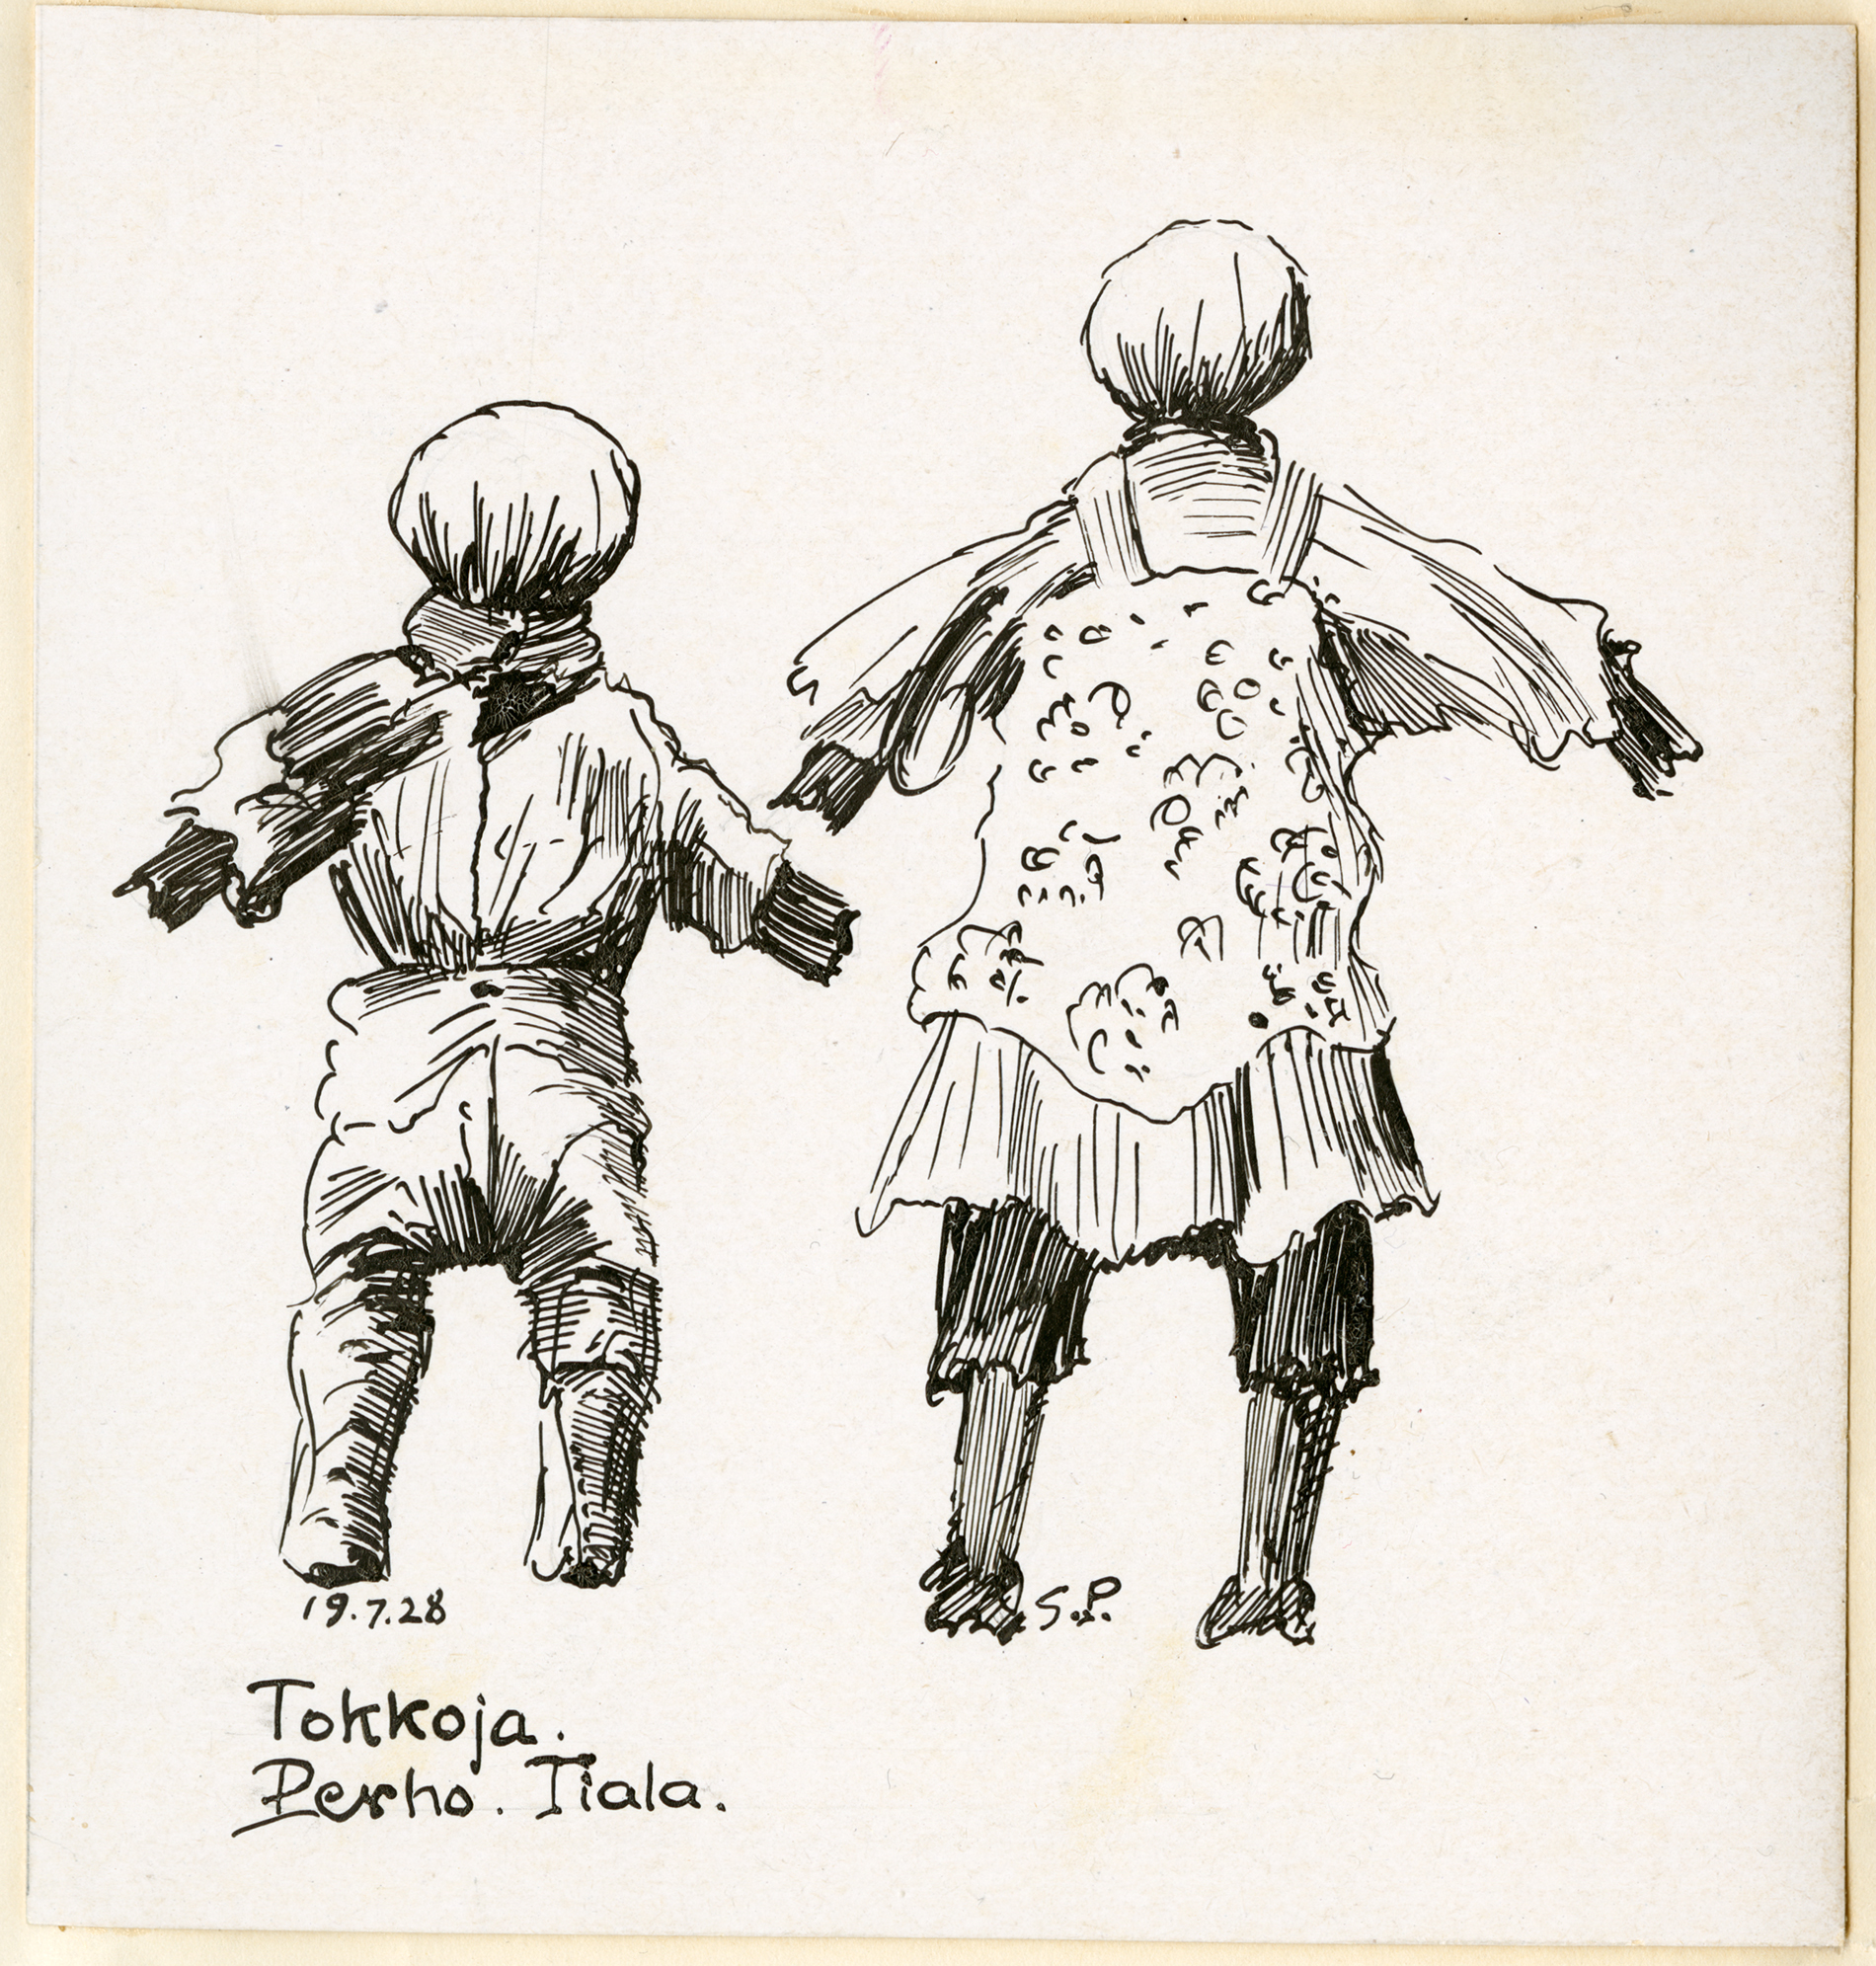 Räsynukkeja Perhon Tialasta, piirretty heinäkuussa 1928. SKS KRA. Piirtäjä Samuli Paulaharju.